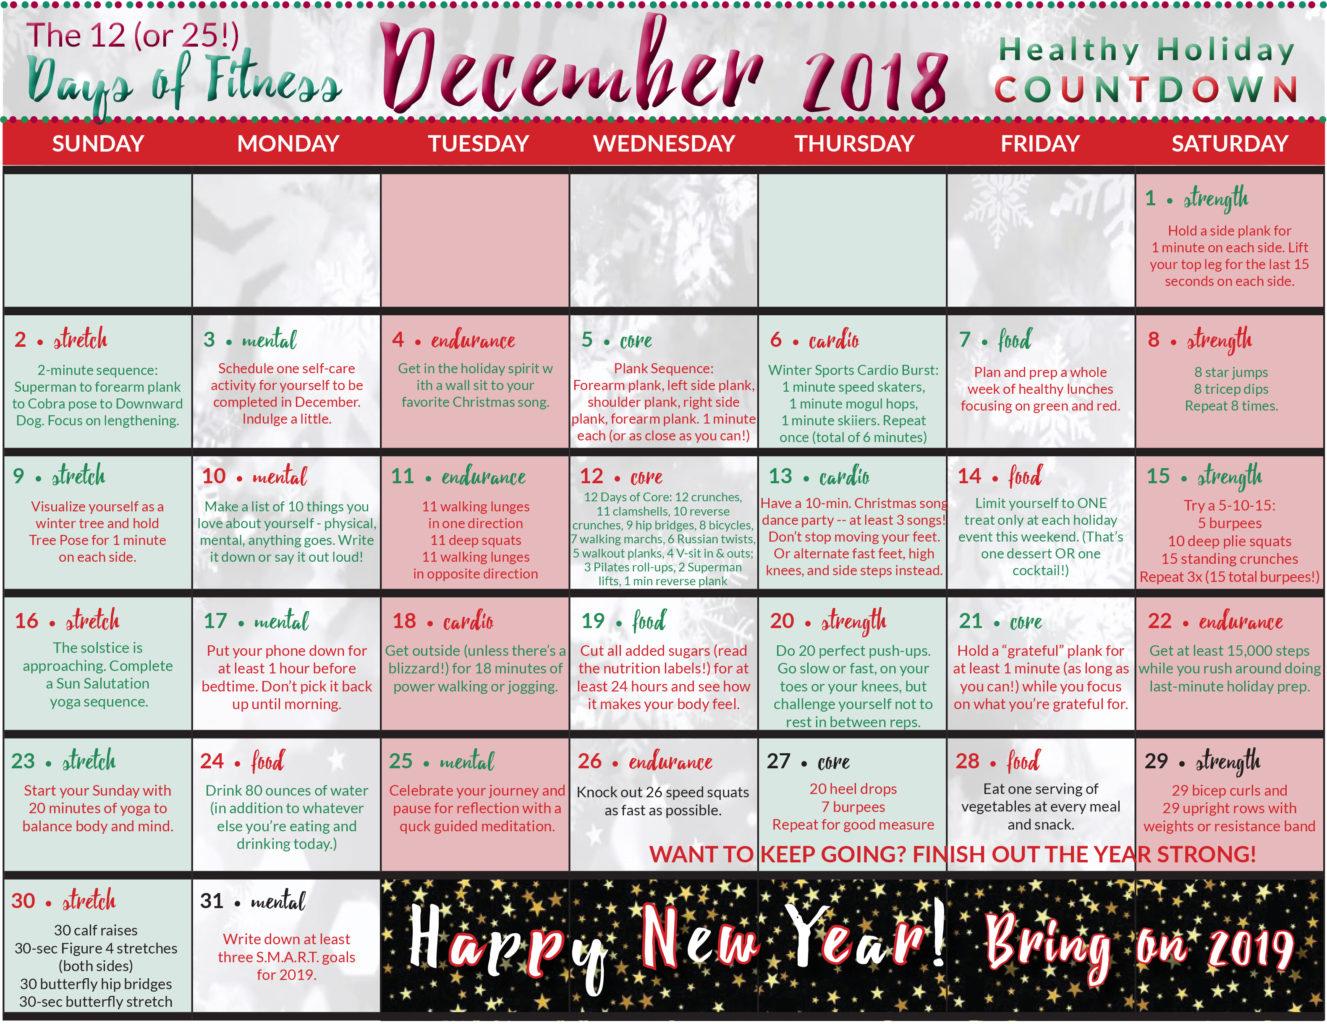 Healthy Holiday Countdown Calendar Neverdonewithfun